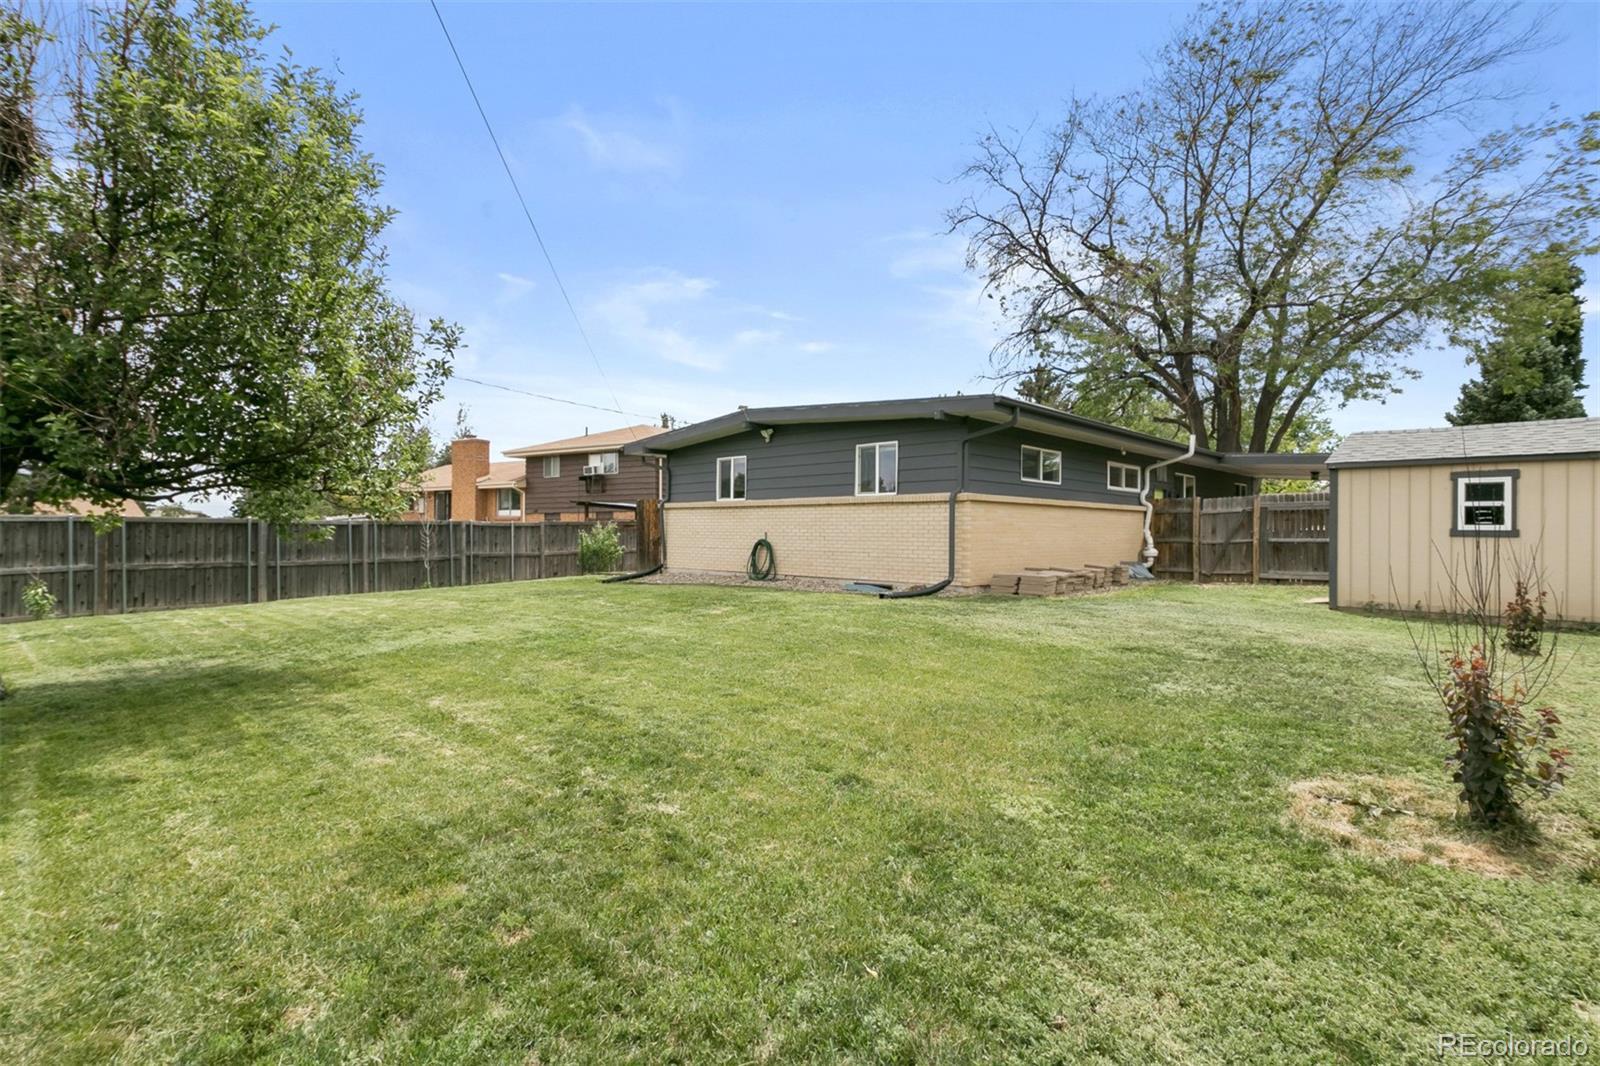 MLS# 8549593 - 37 - 3302 S Wabash Circle, Denver, CO 80231